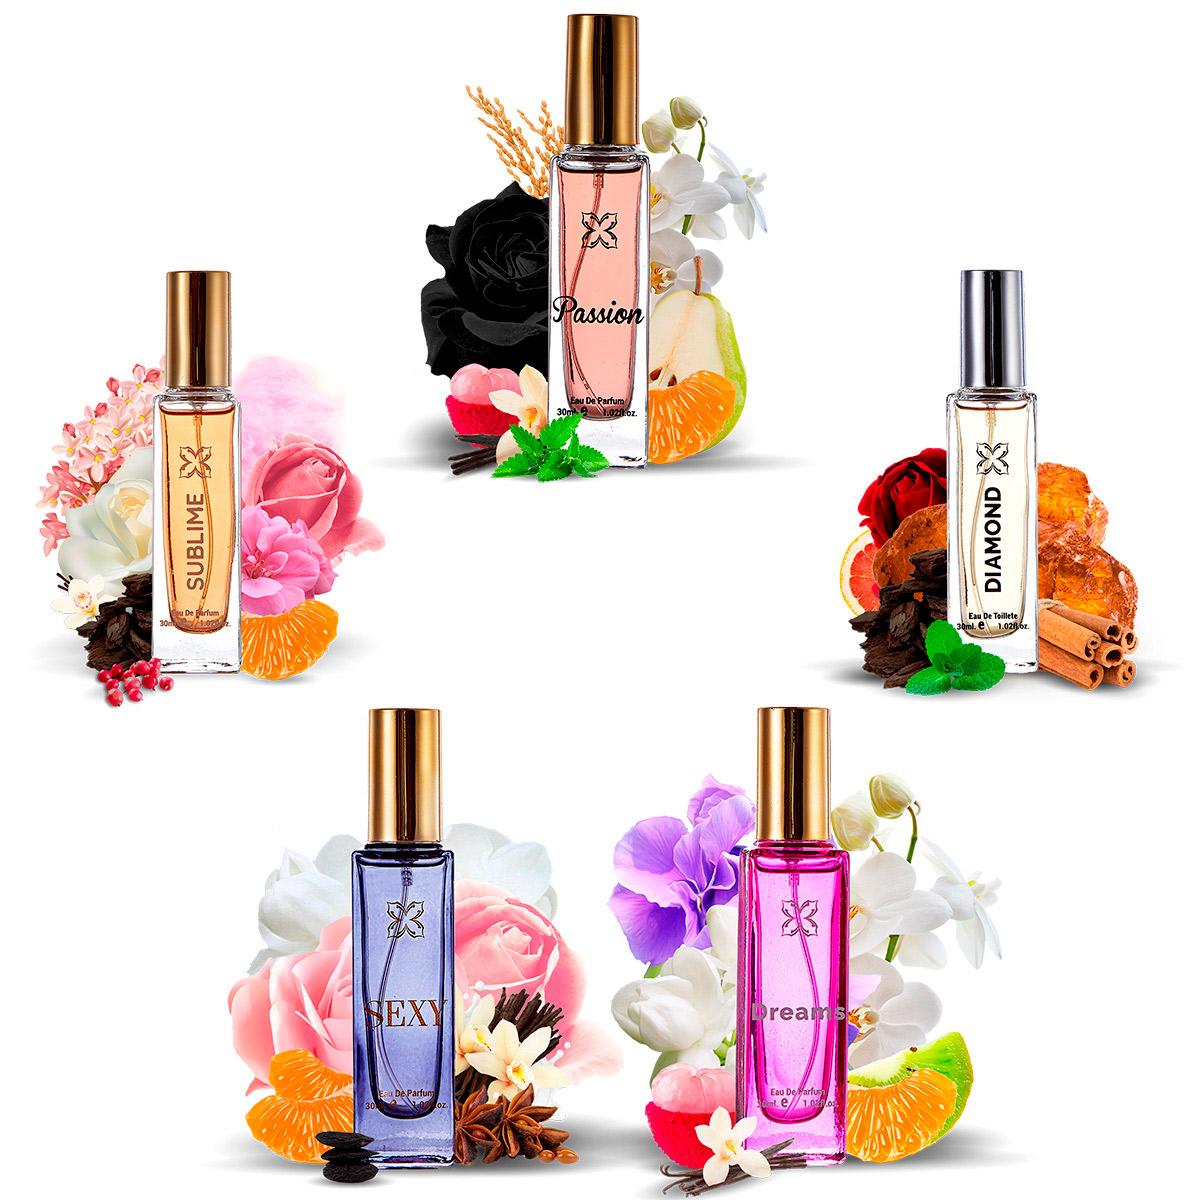 Kit 5 Perfumes Essenciart 30ml Masculino e Feminino Atacado